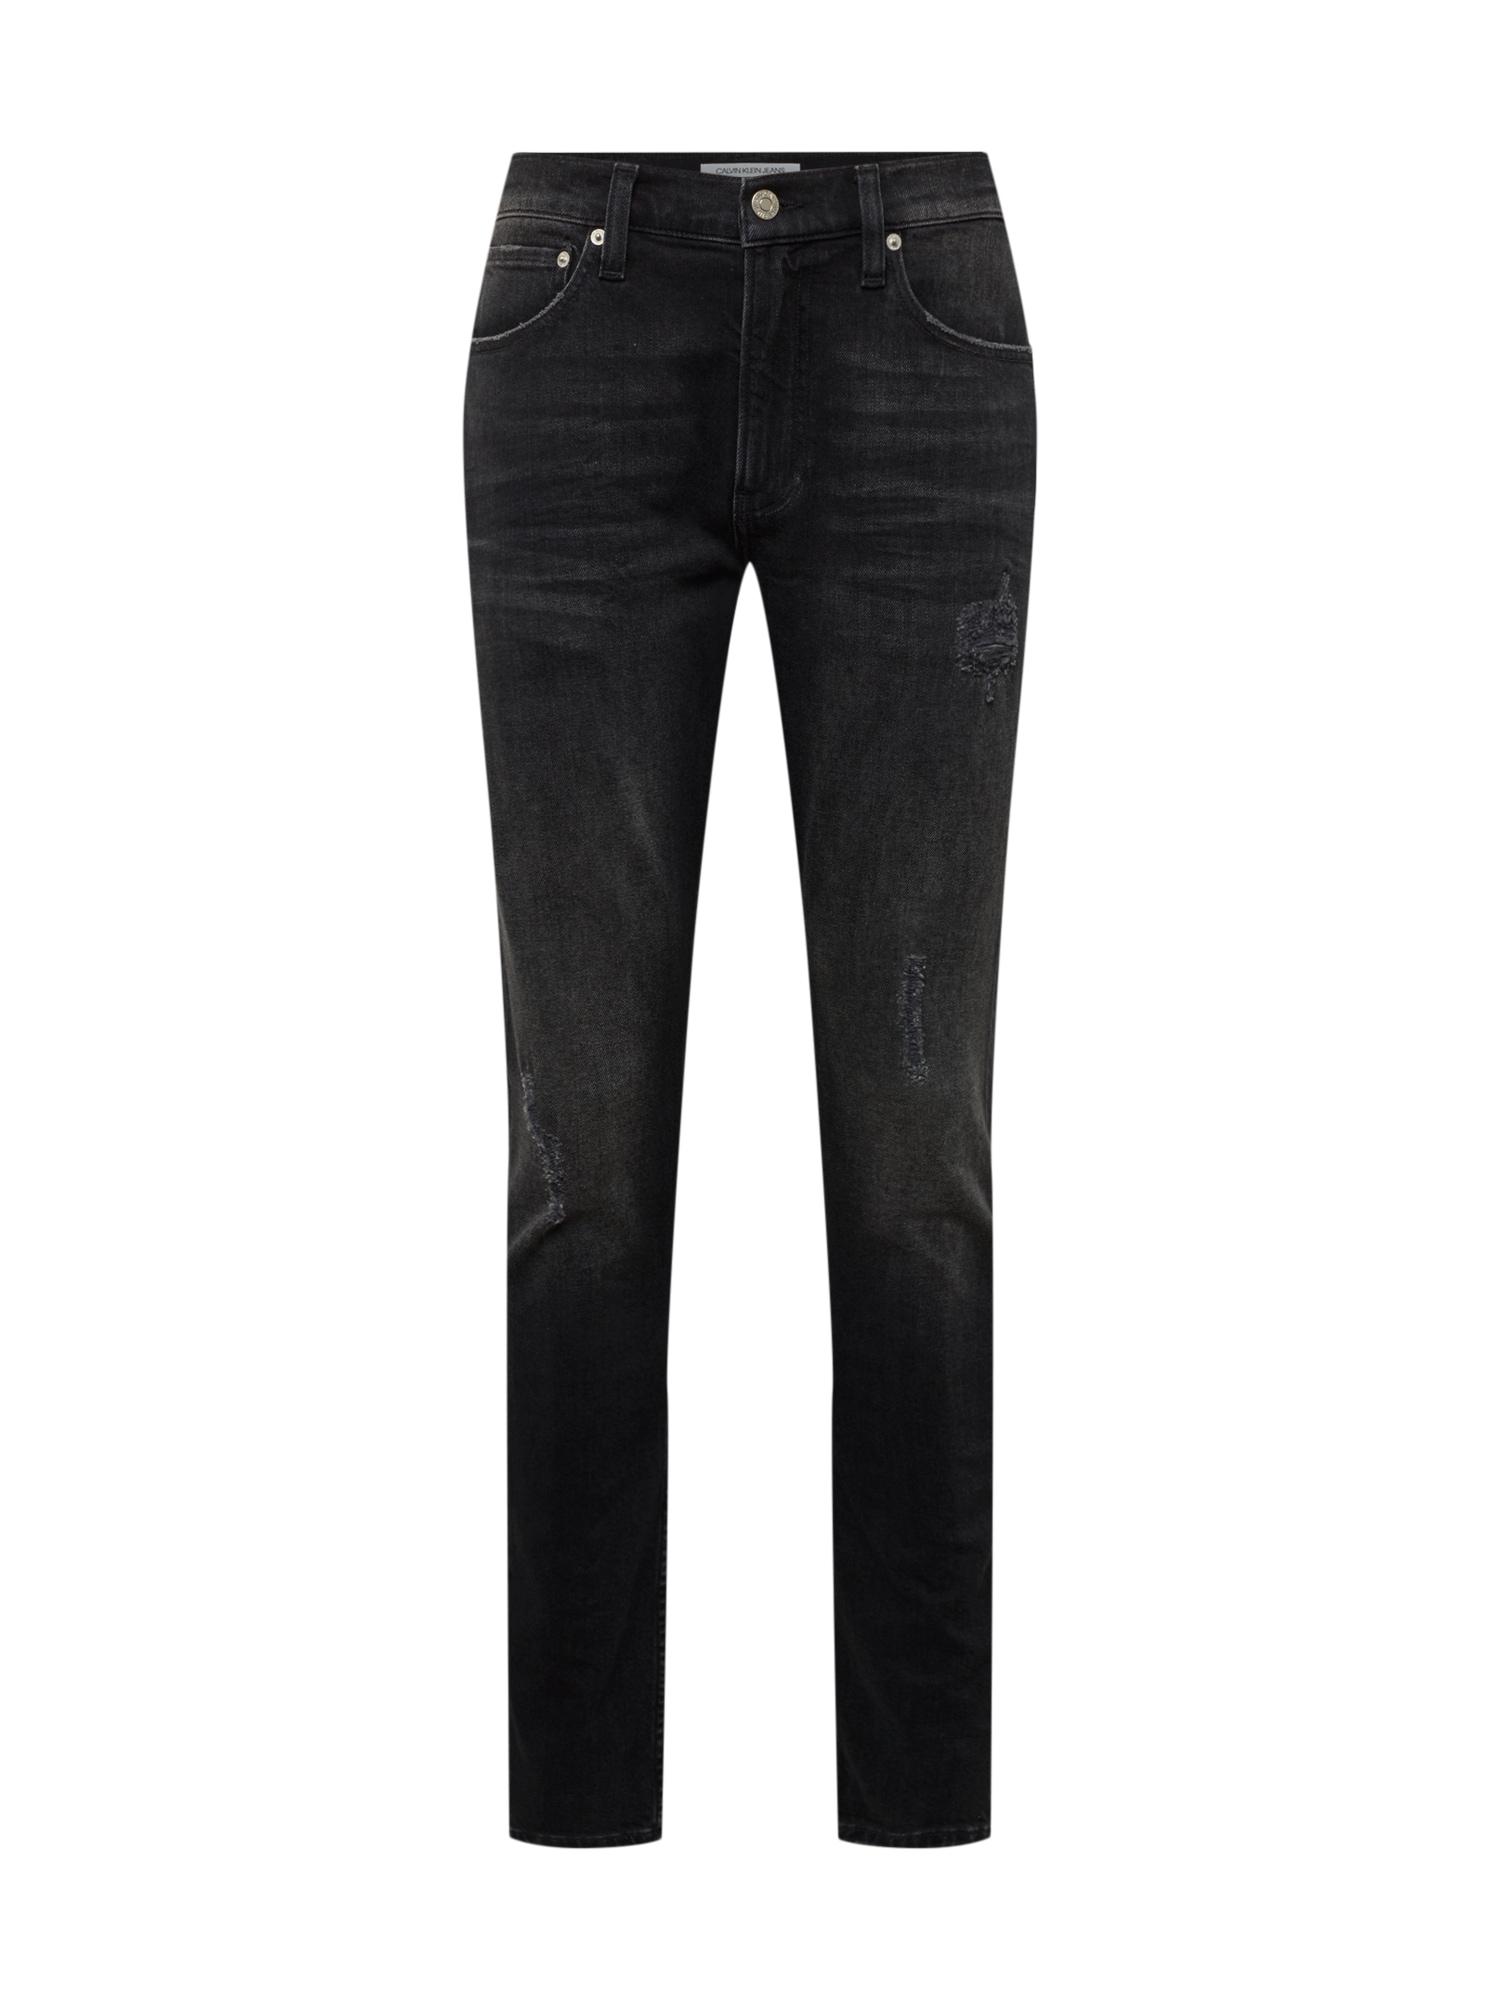 Džíny 058 SLIM TAPER černá džínovina Calvin Klein Jeans